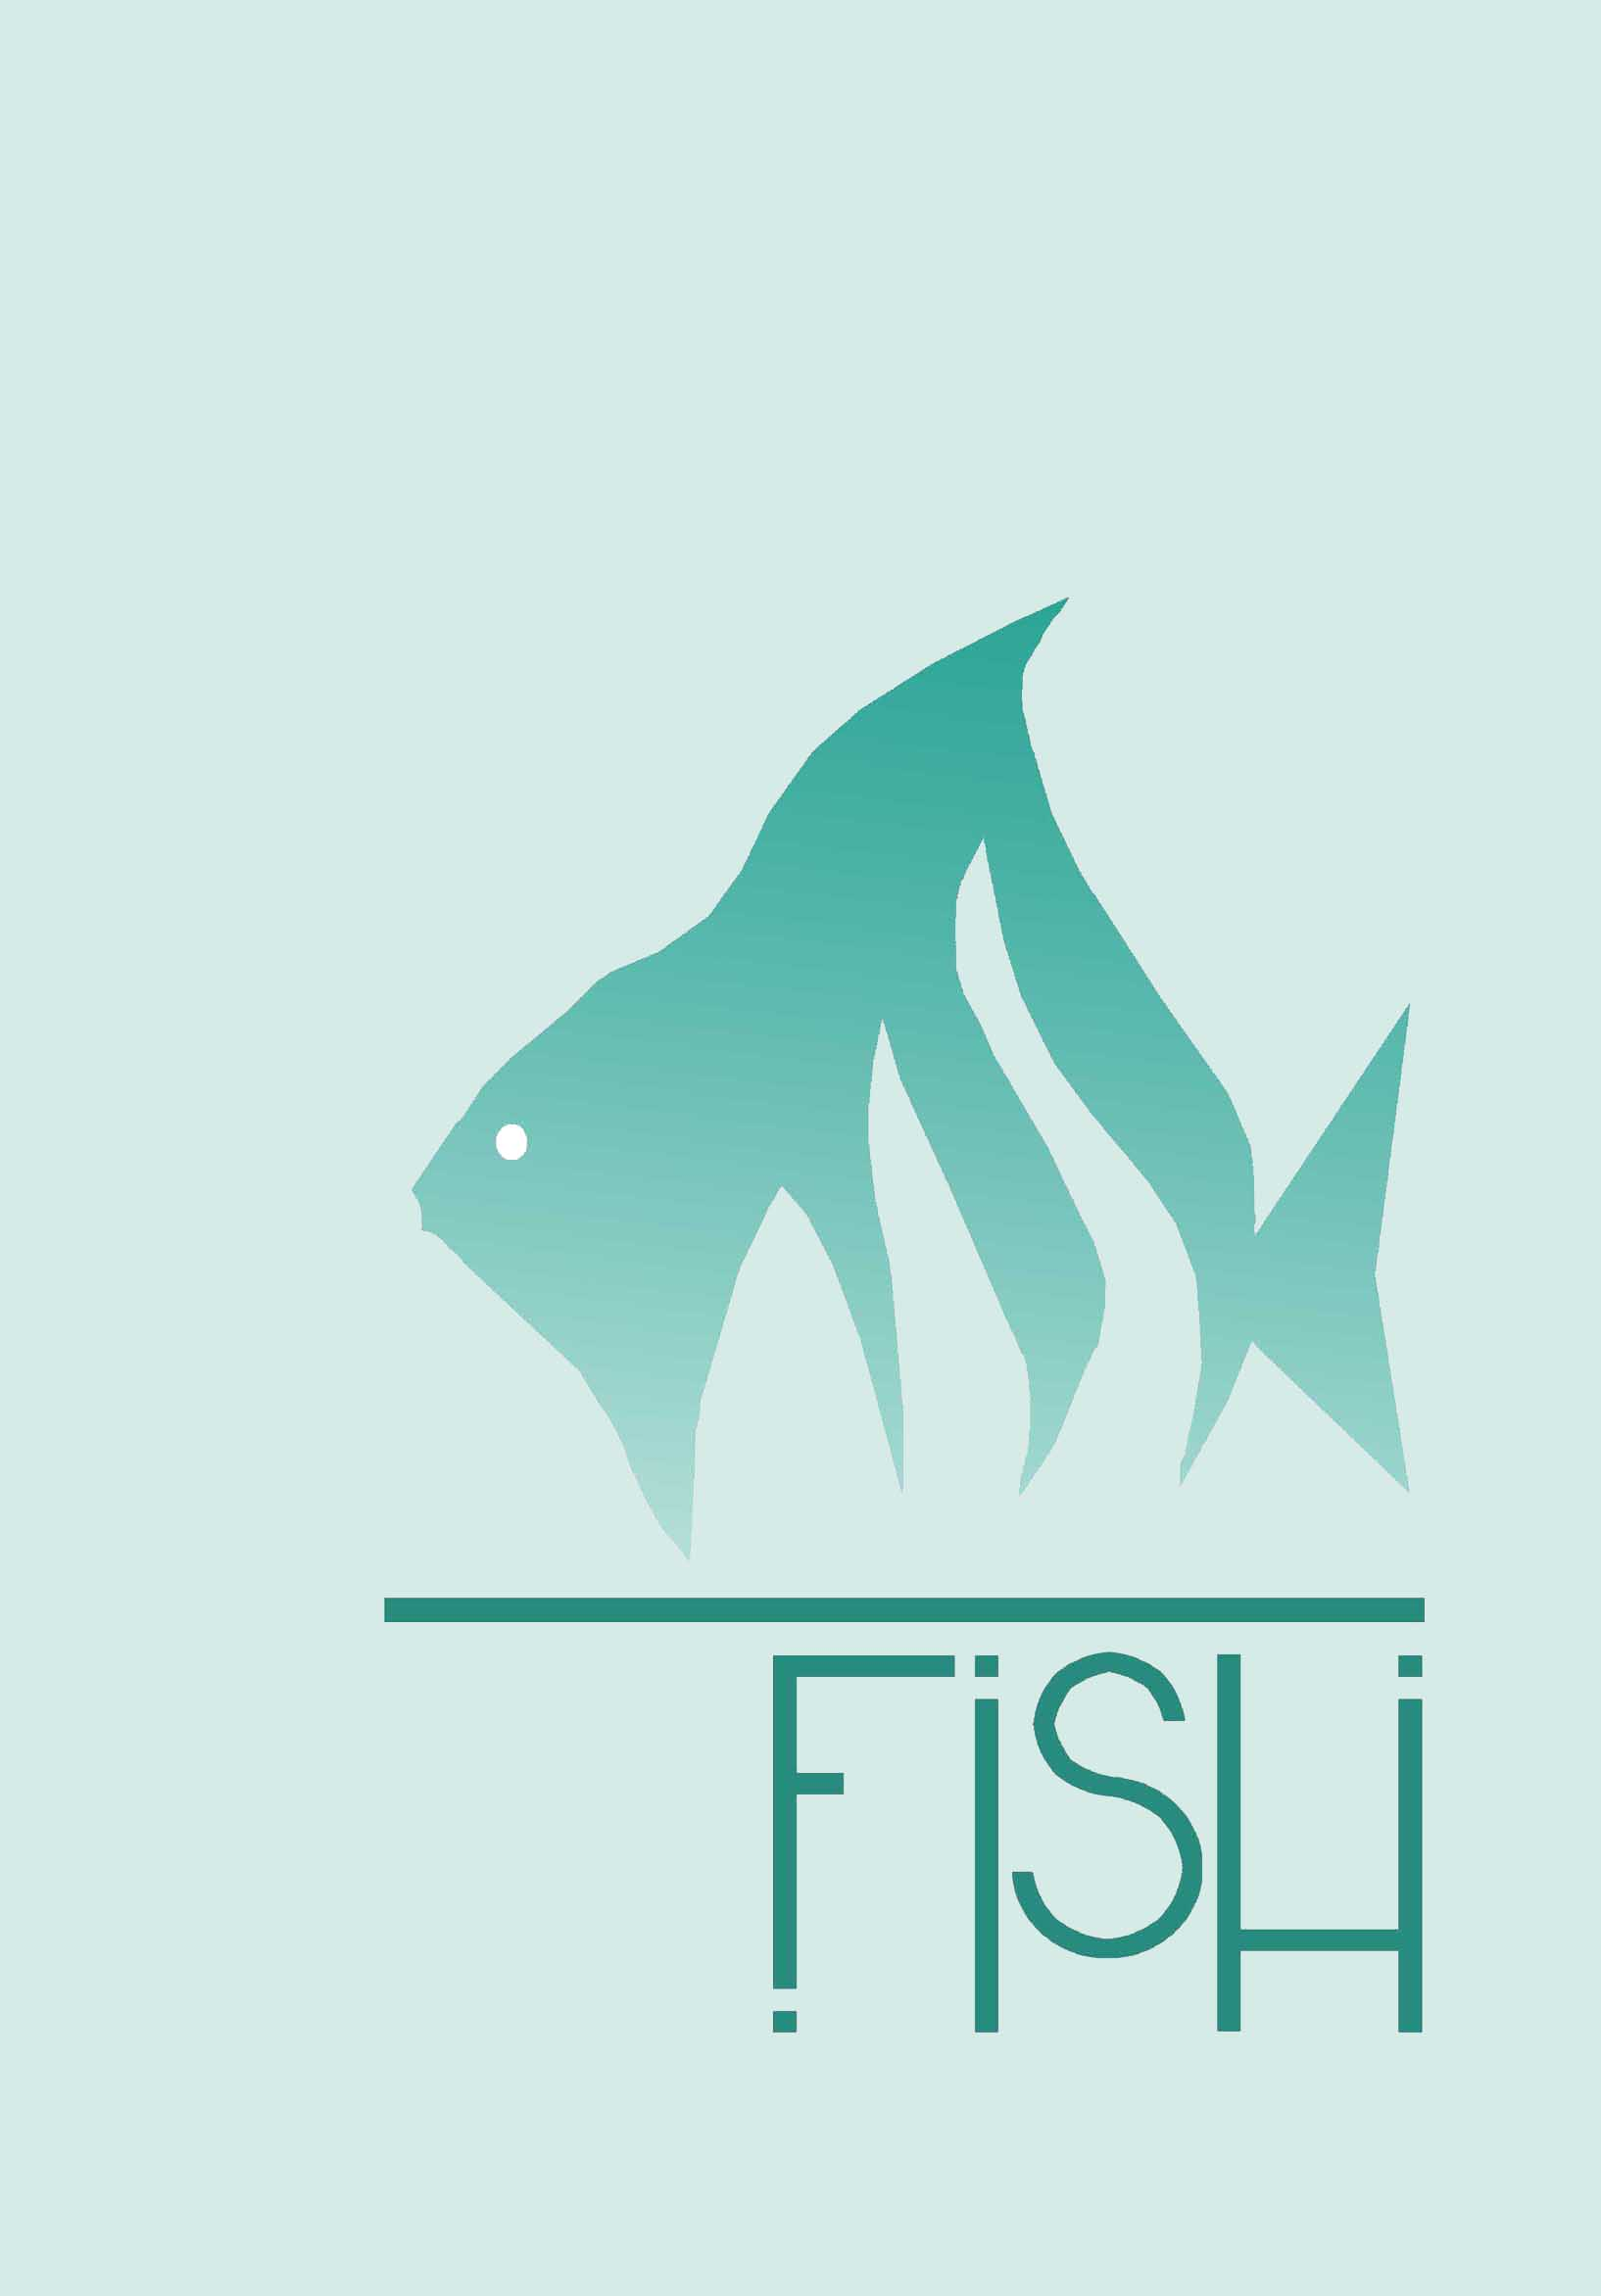 Fish logo pictures - photo#7